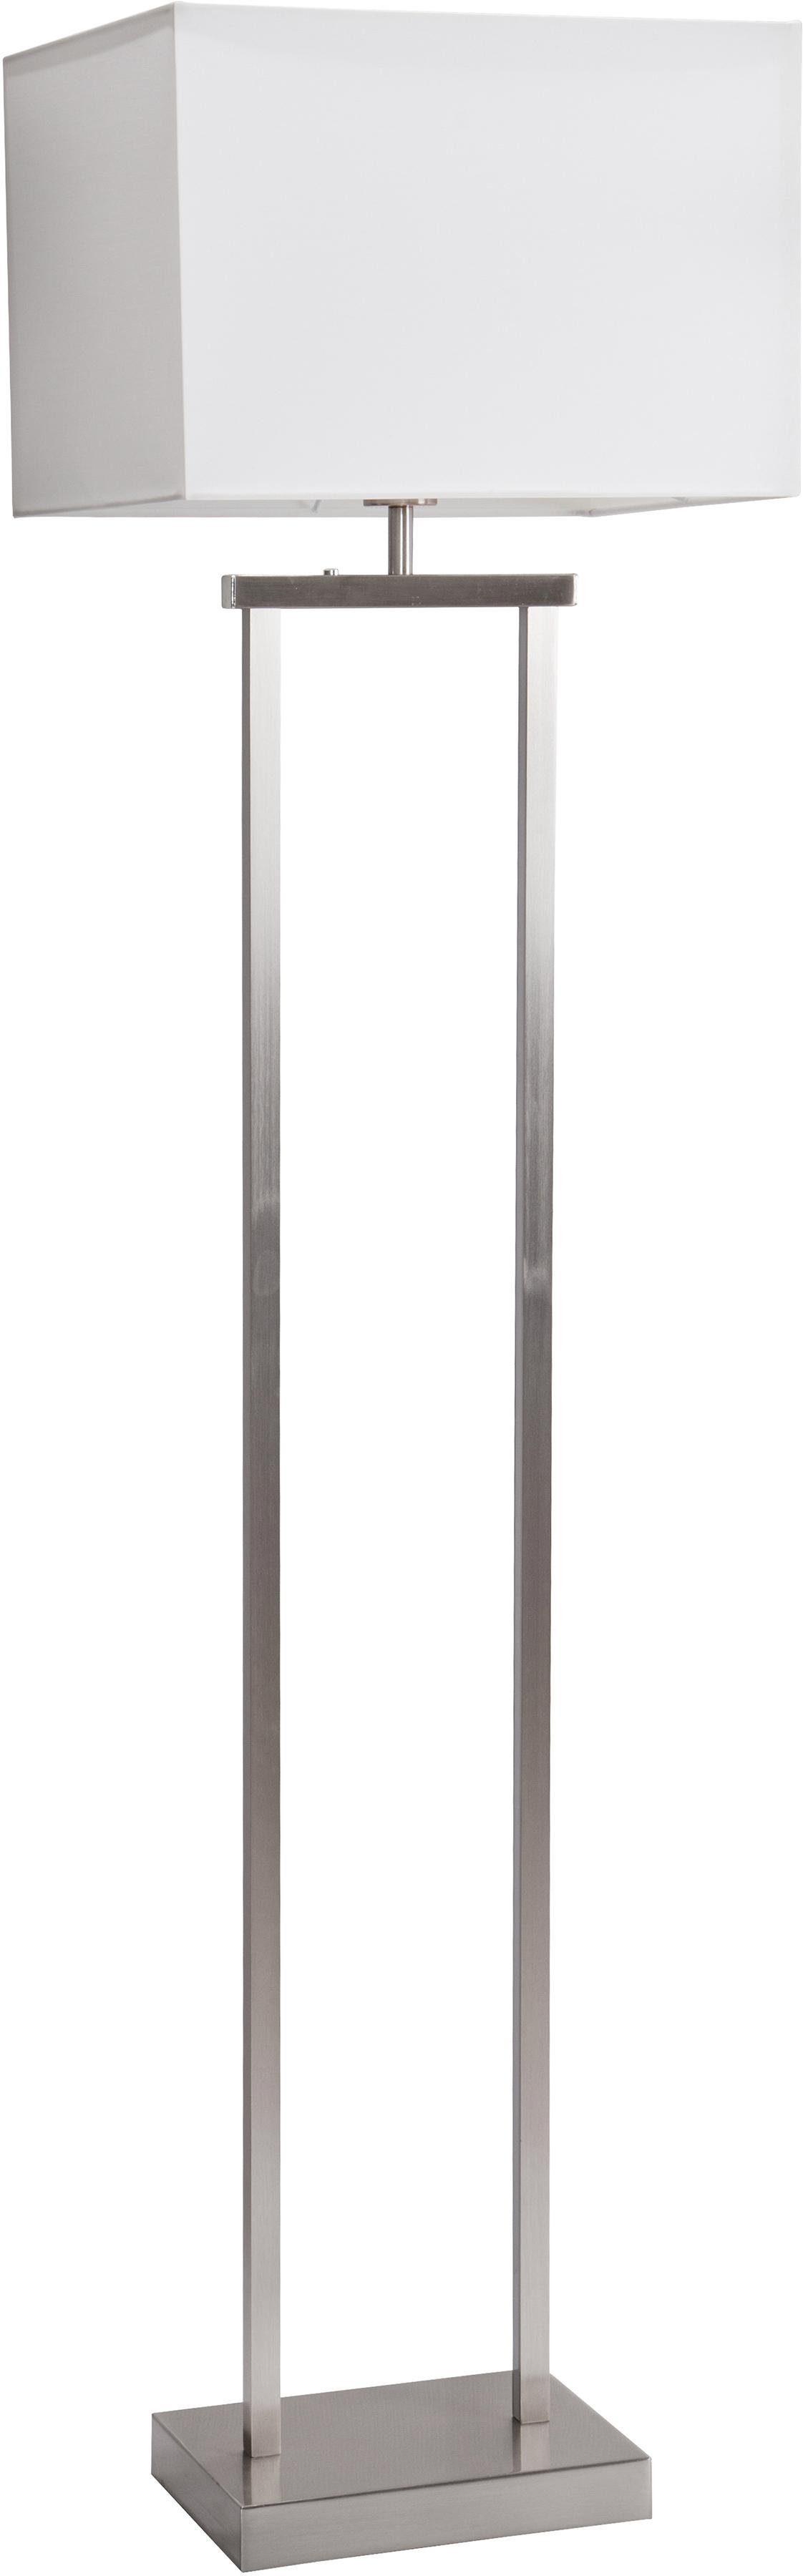 Nino Leuchten LED Stehlampe »SYDNEY«, 2-flammig